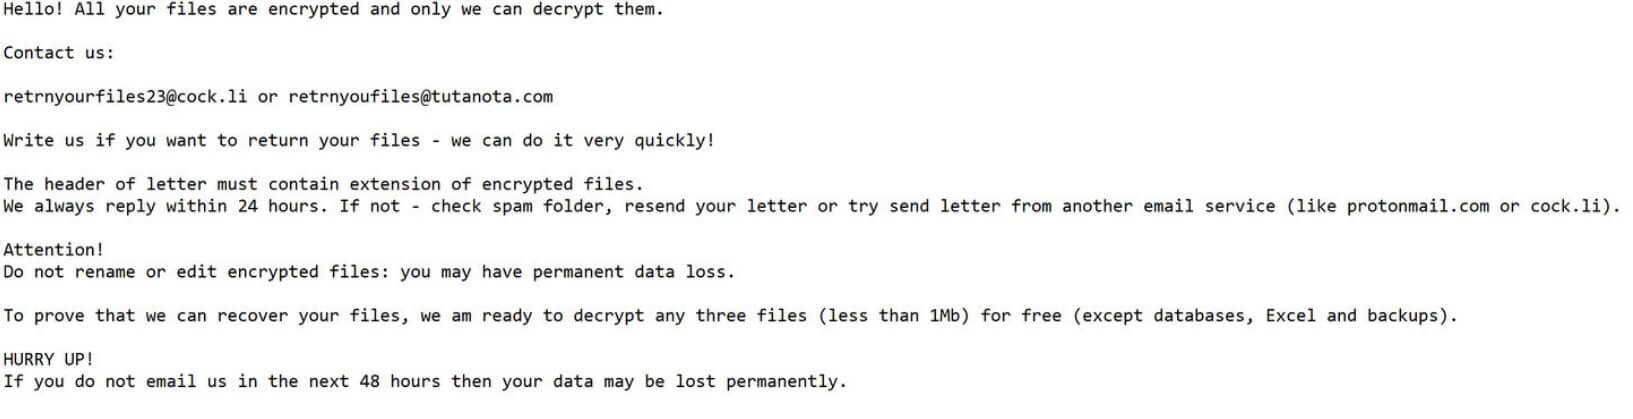 stf-hhmgzyl-virus-file-ransomware-note